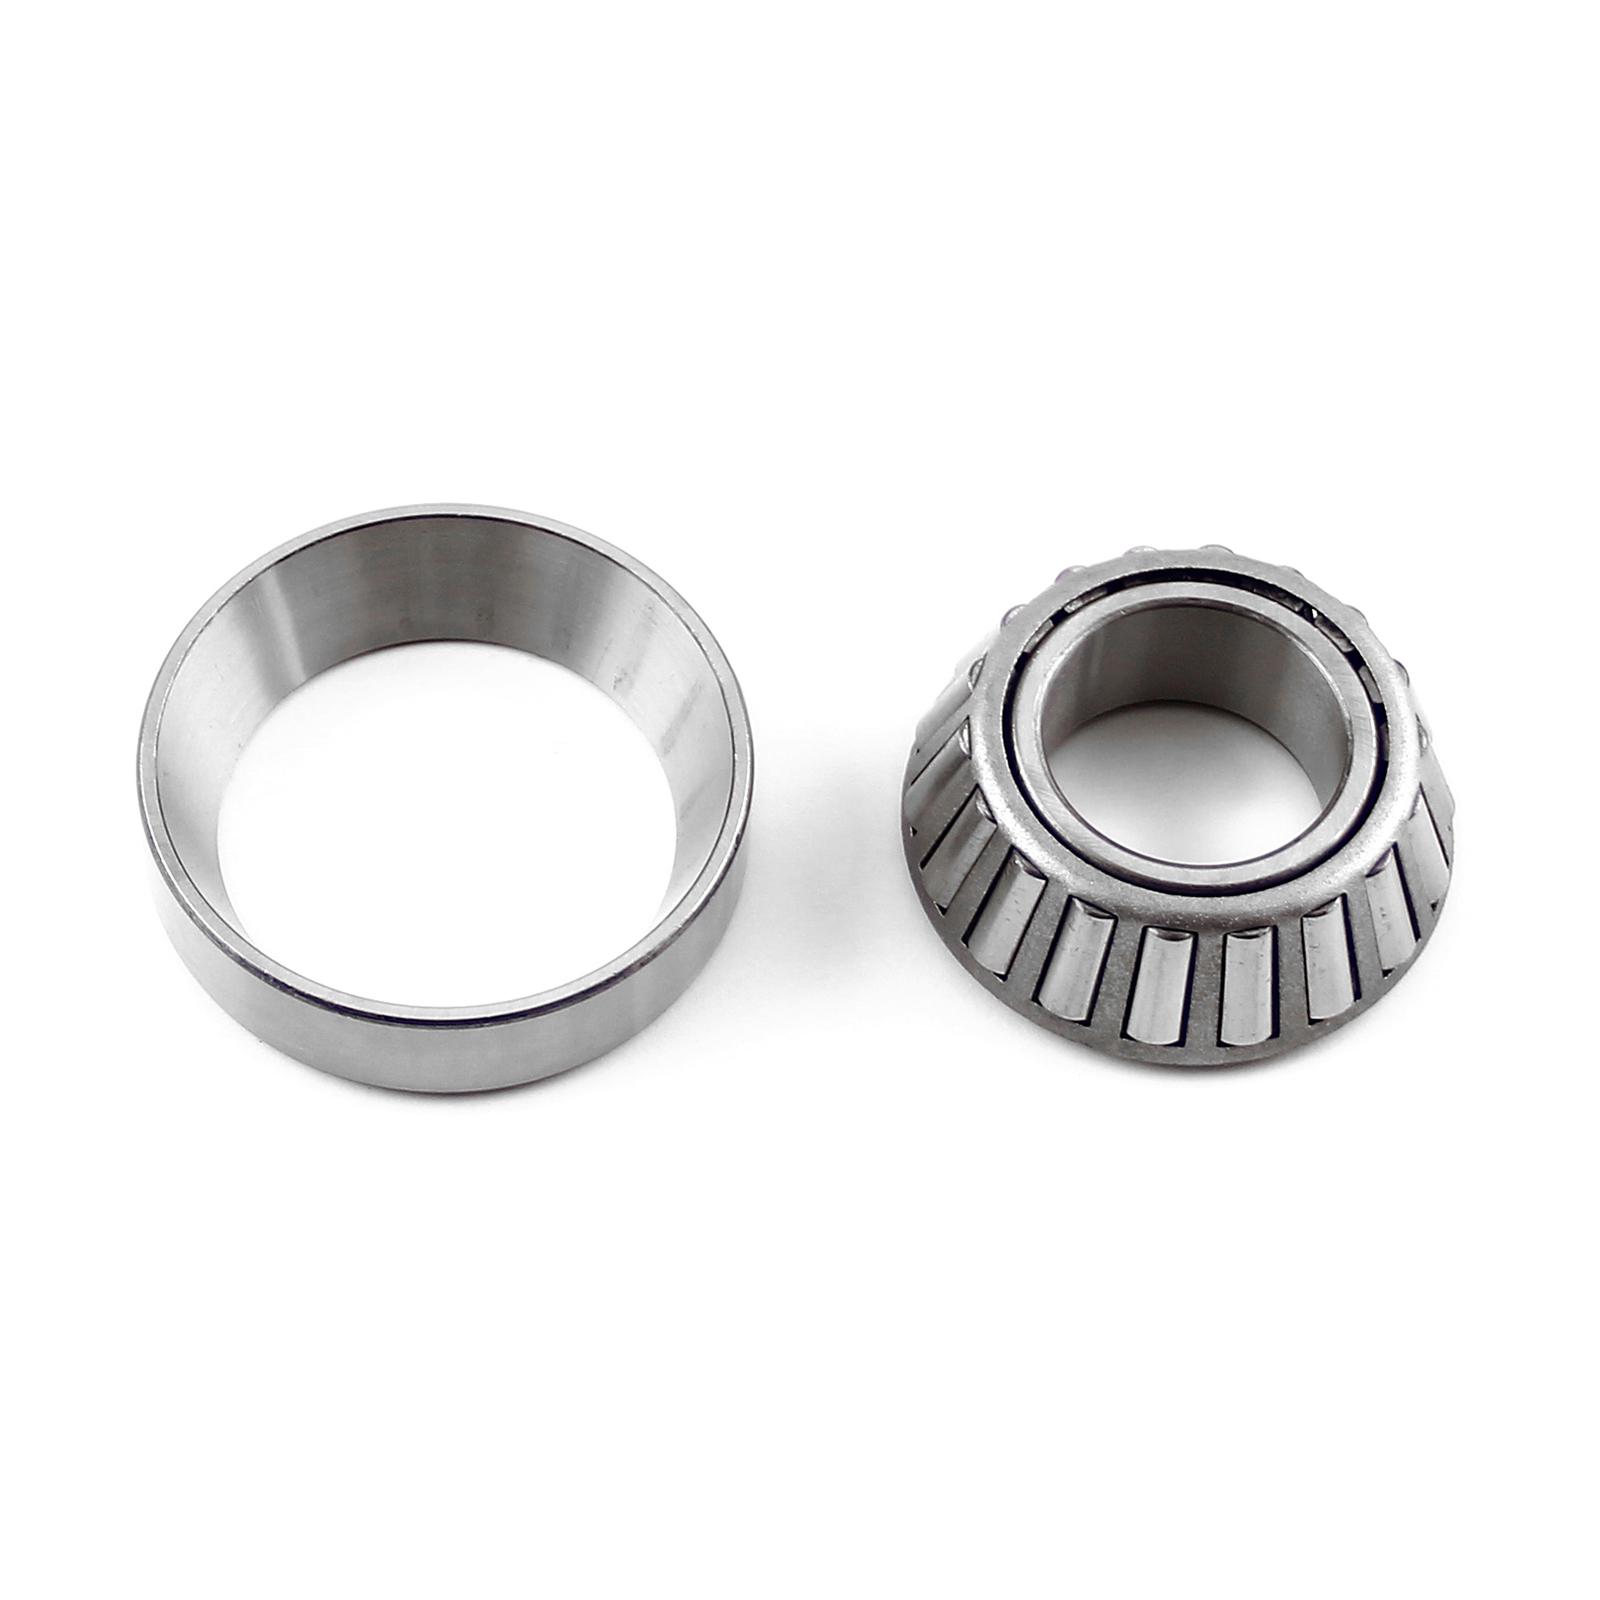 Pinion Bearing Industry Std Ref: M88048 / M88010